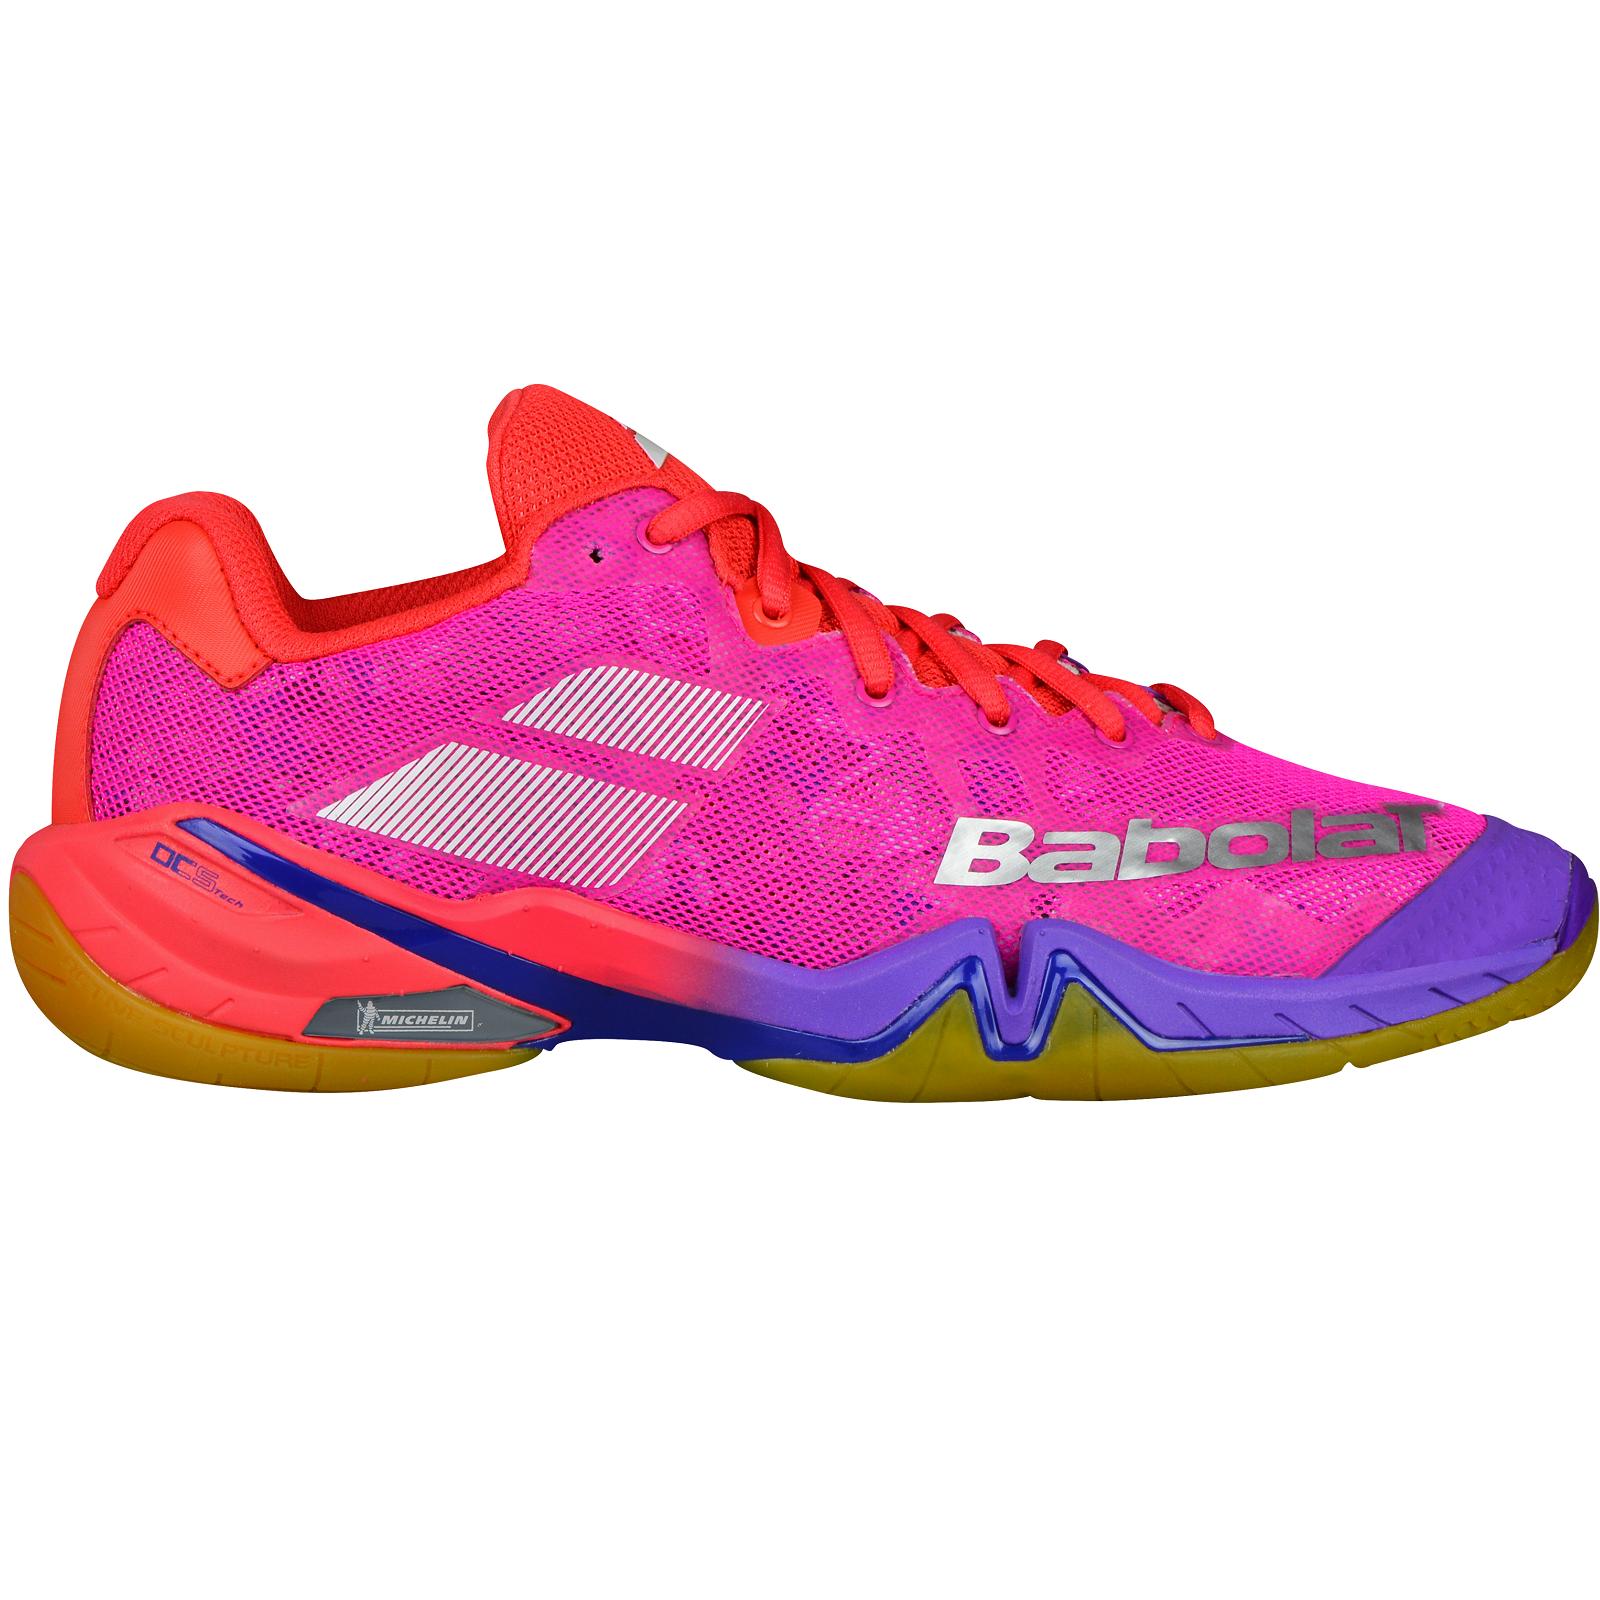 Babolat Shadow Tour 2019 Schuhe Badminton Squash Hallenschuhe Indoor 31S1802 299